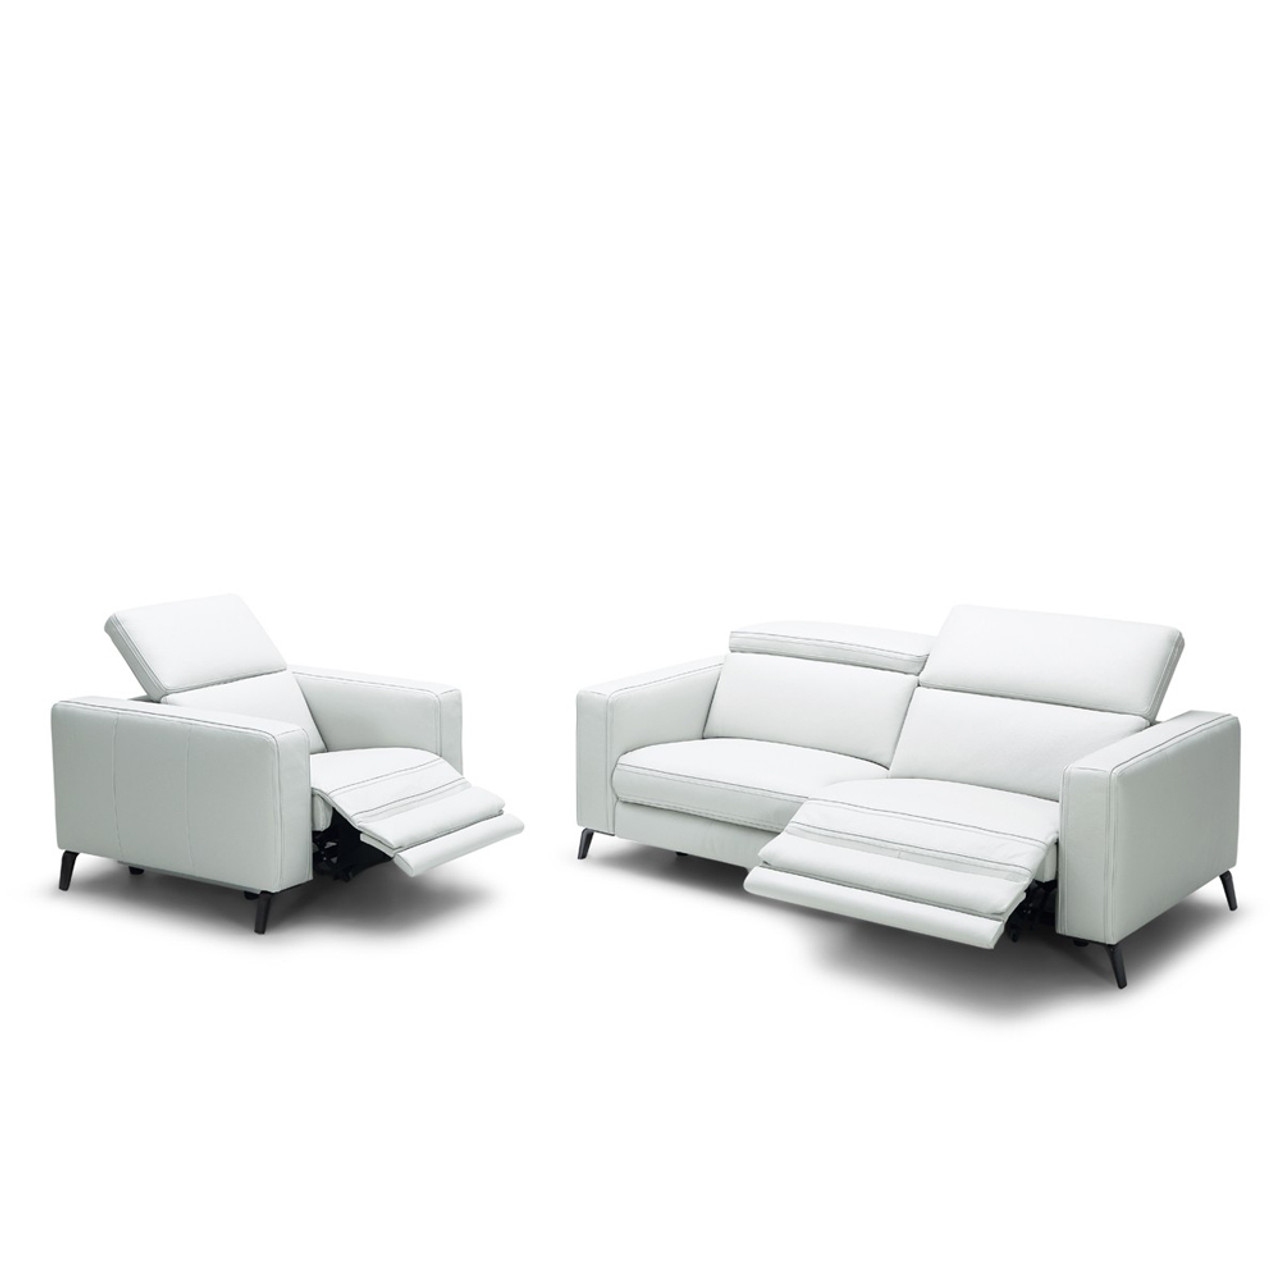 Divani Casa Roslyn Modern White Leather Sofa Set w/ Recliners